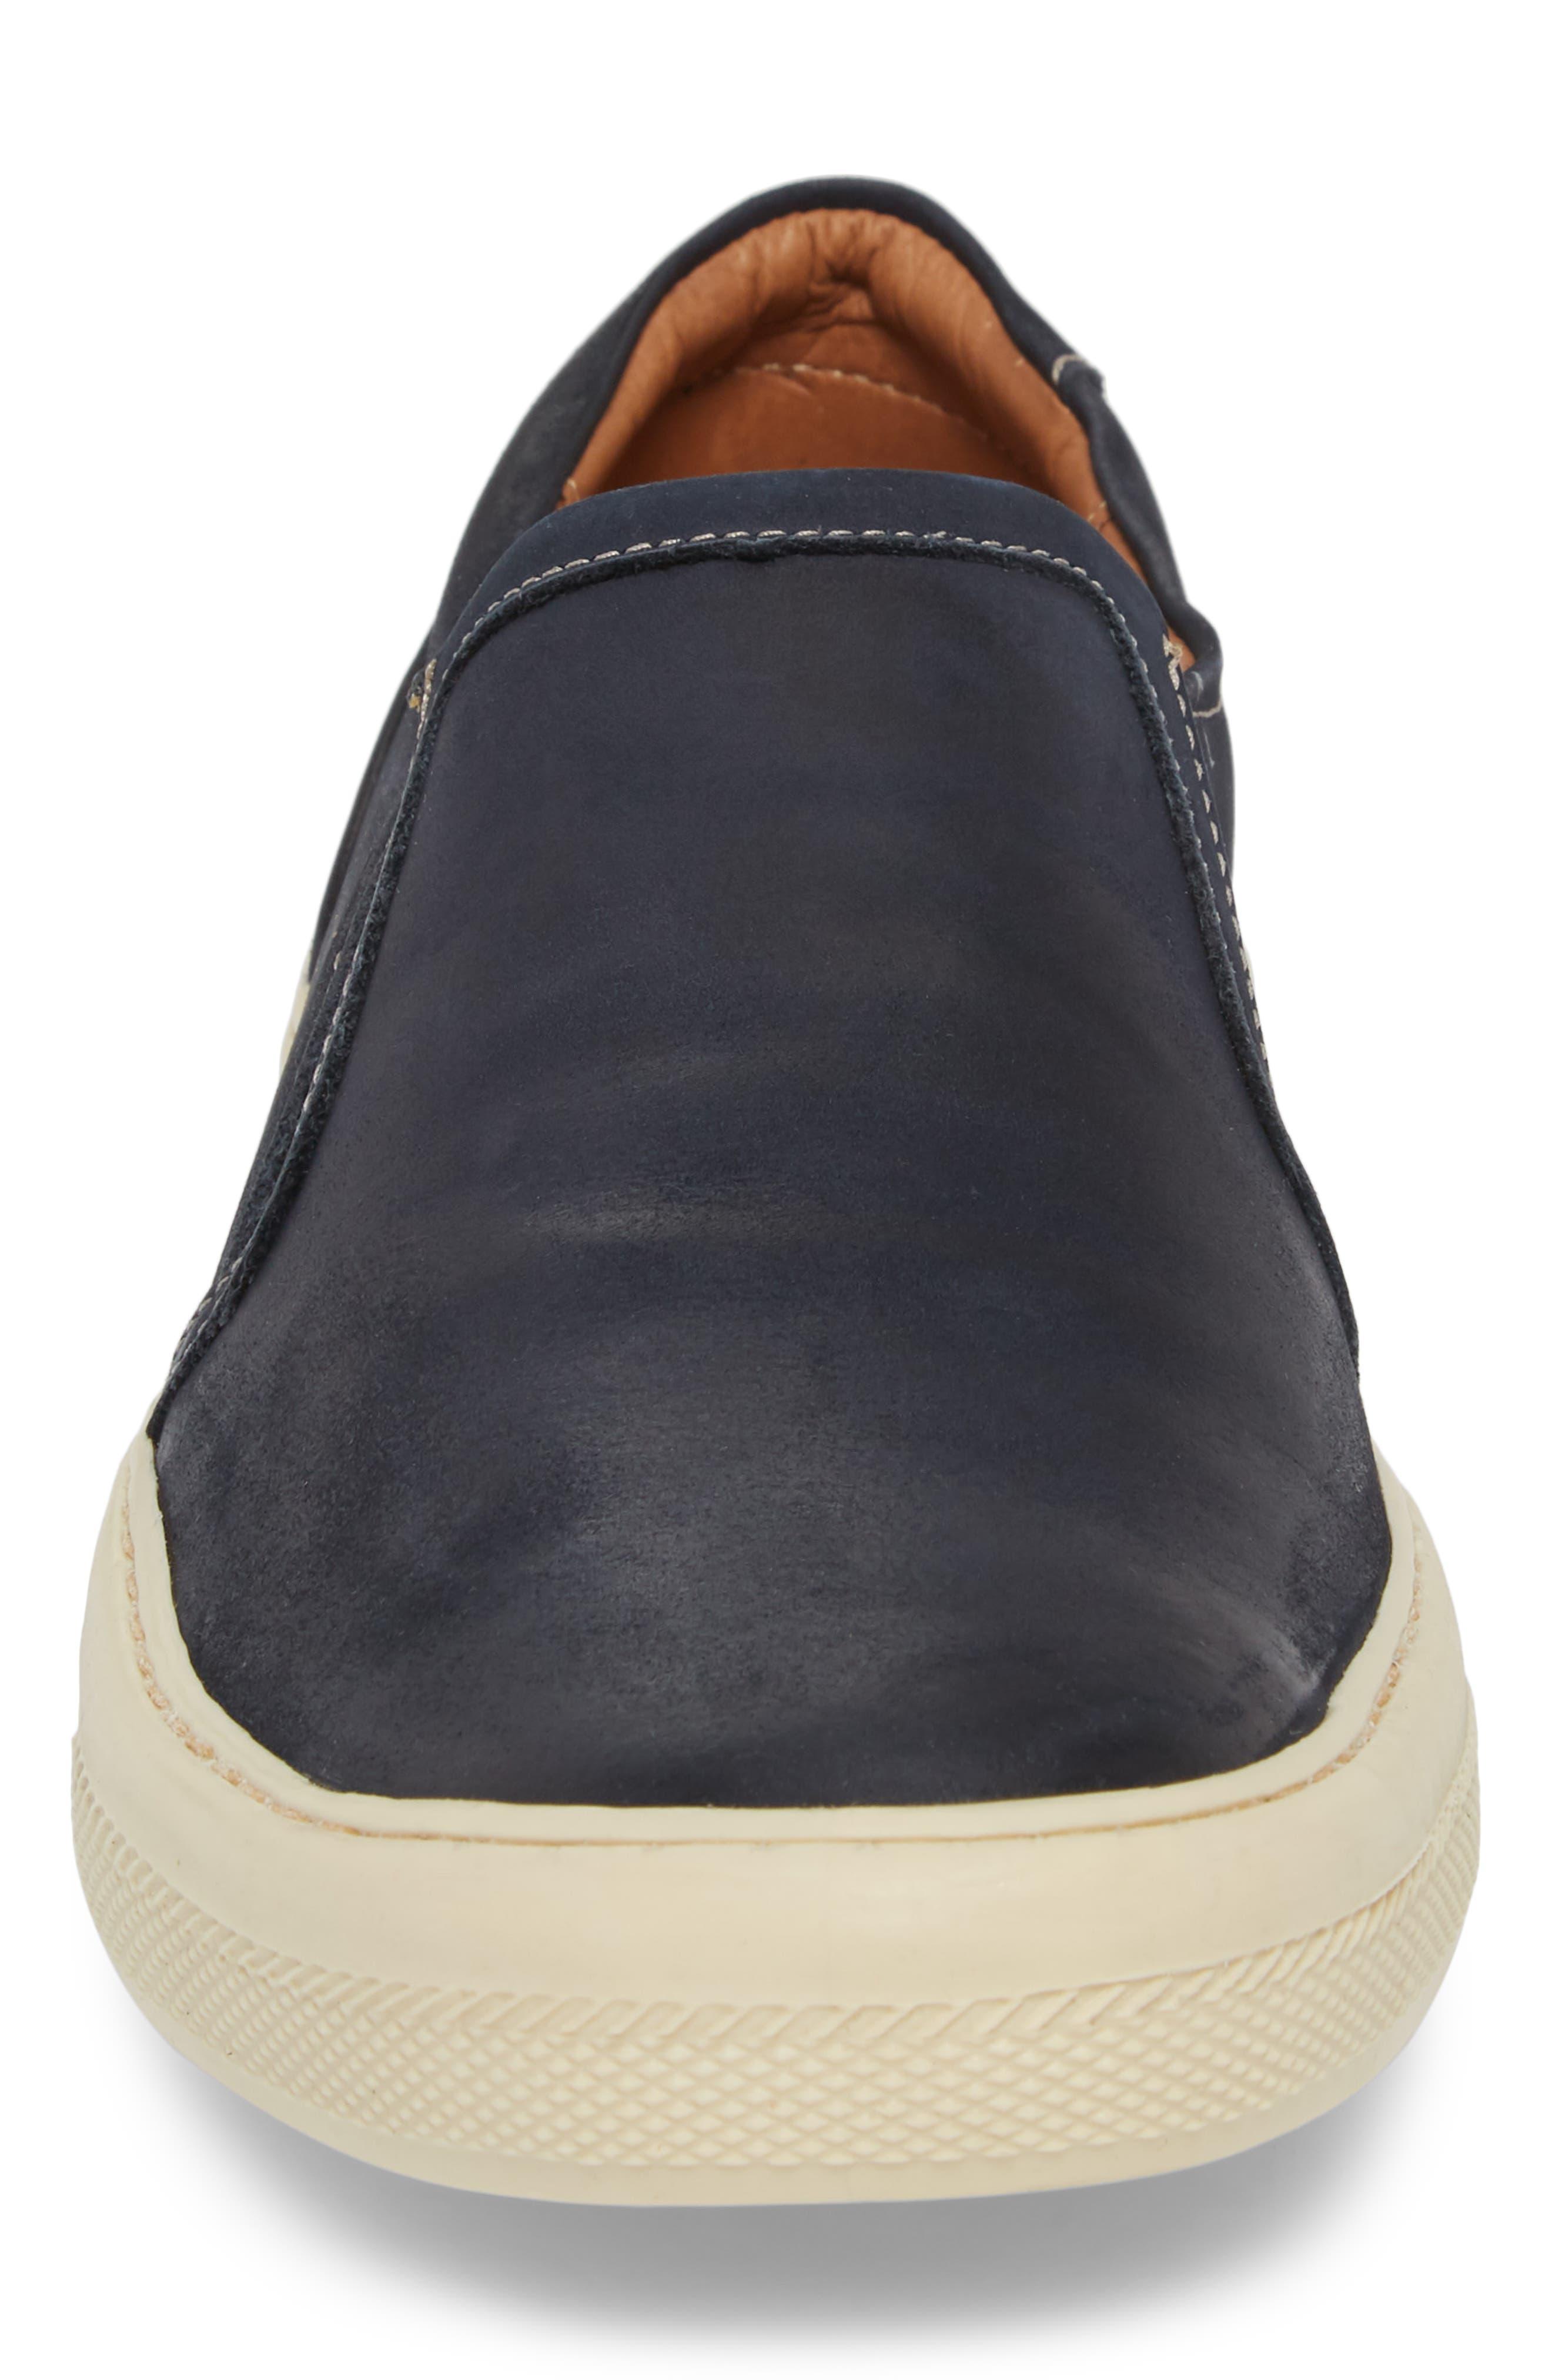 Alternate Image 4  - ANATOMIC & CO. Itabuna Slip-On Sneaker (Men)